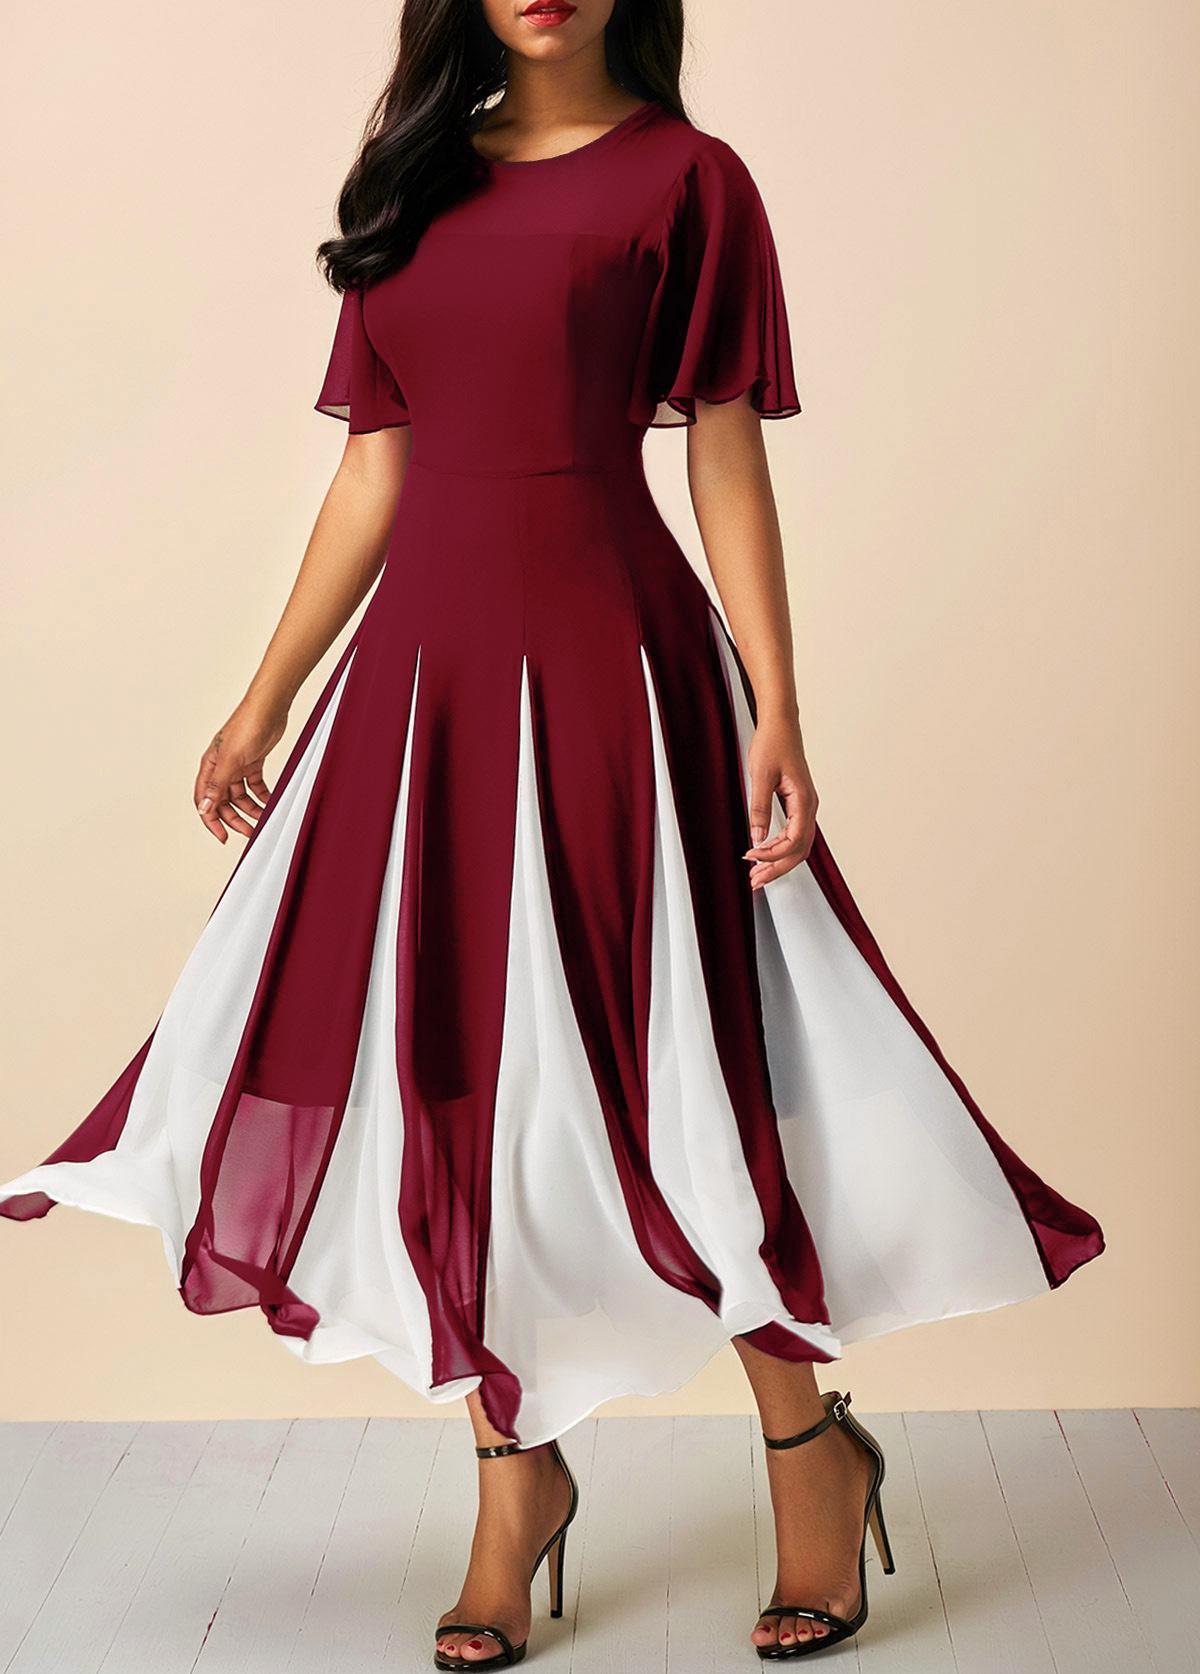 Short Sleeve Wine Red Round Neck Chiffon Dress